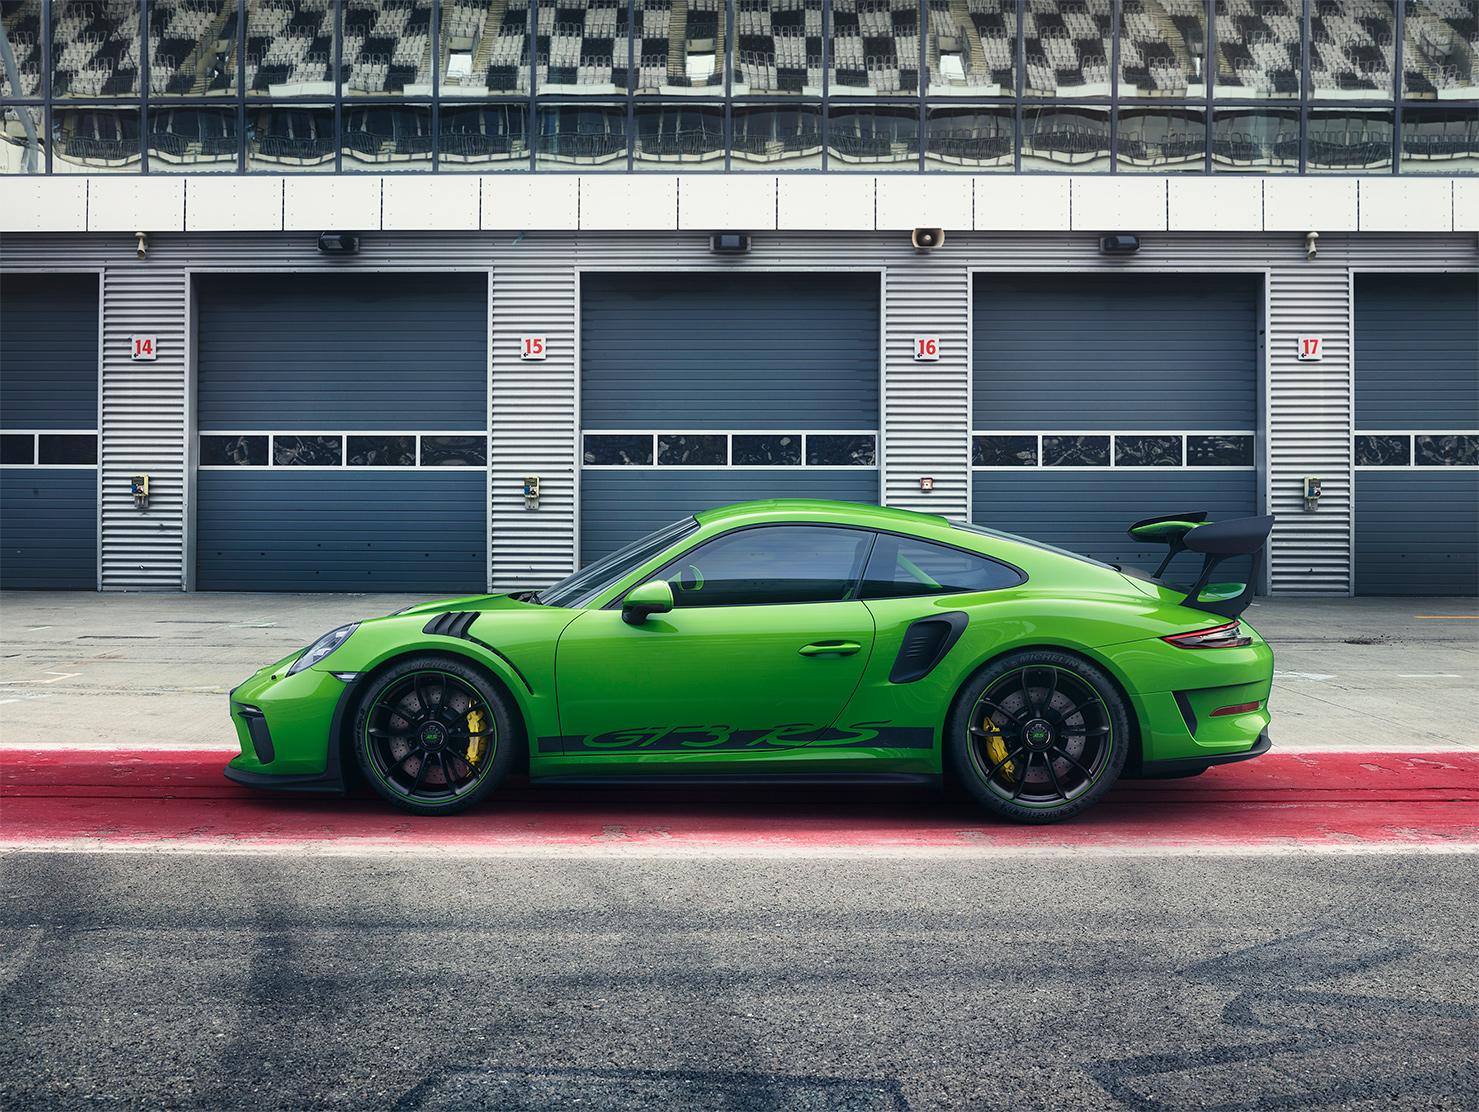 TrackWorthy - 2019 Porsche 911 GT3 RS (3)